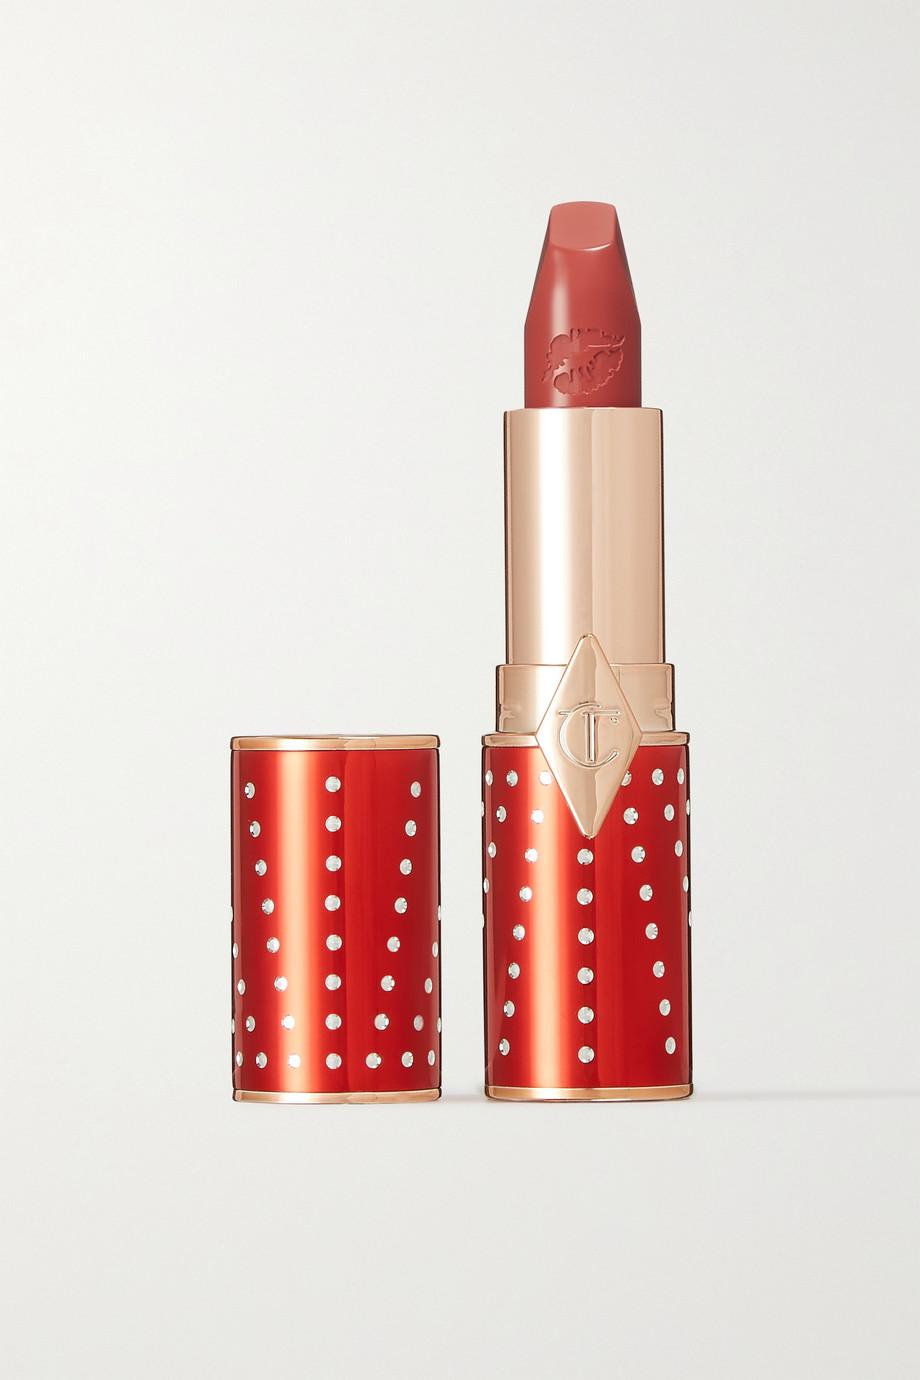 Charlotte Tilbury K.I.S.S.I.N.G Lipstick - Sweet Blossom